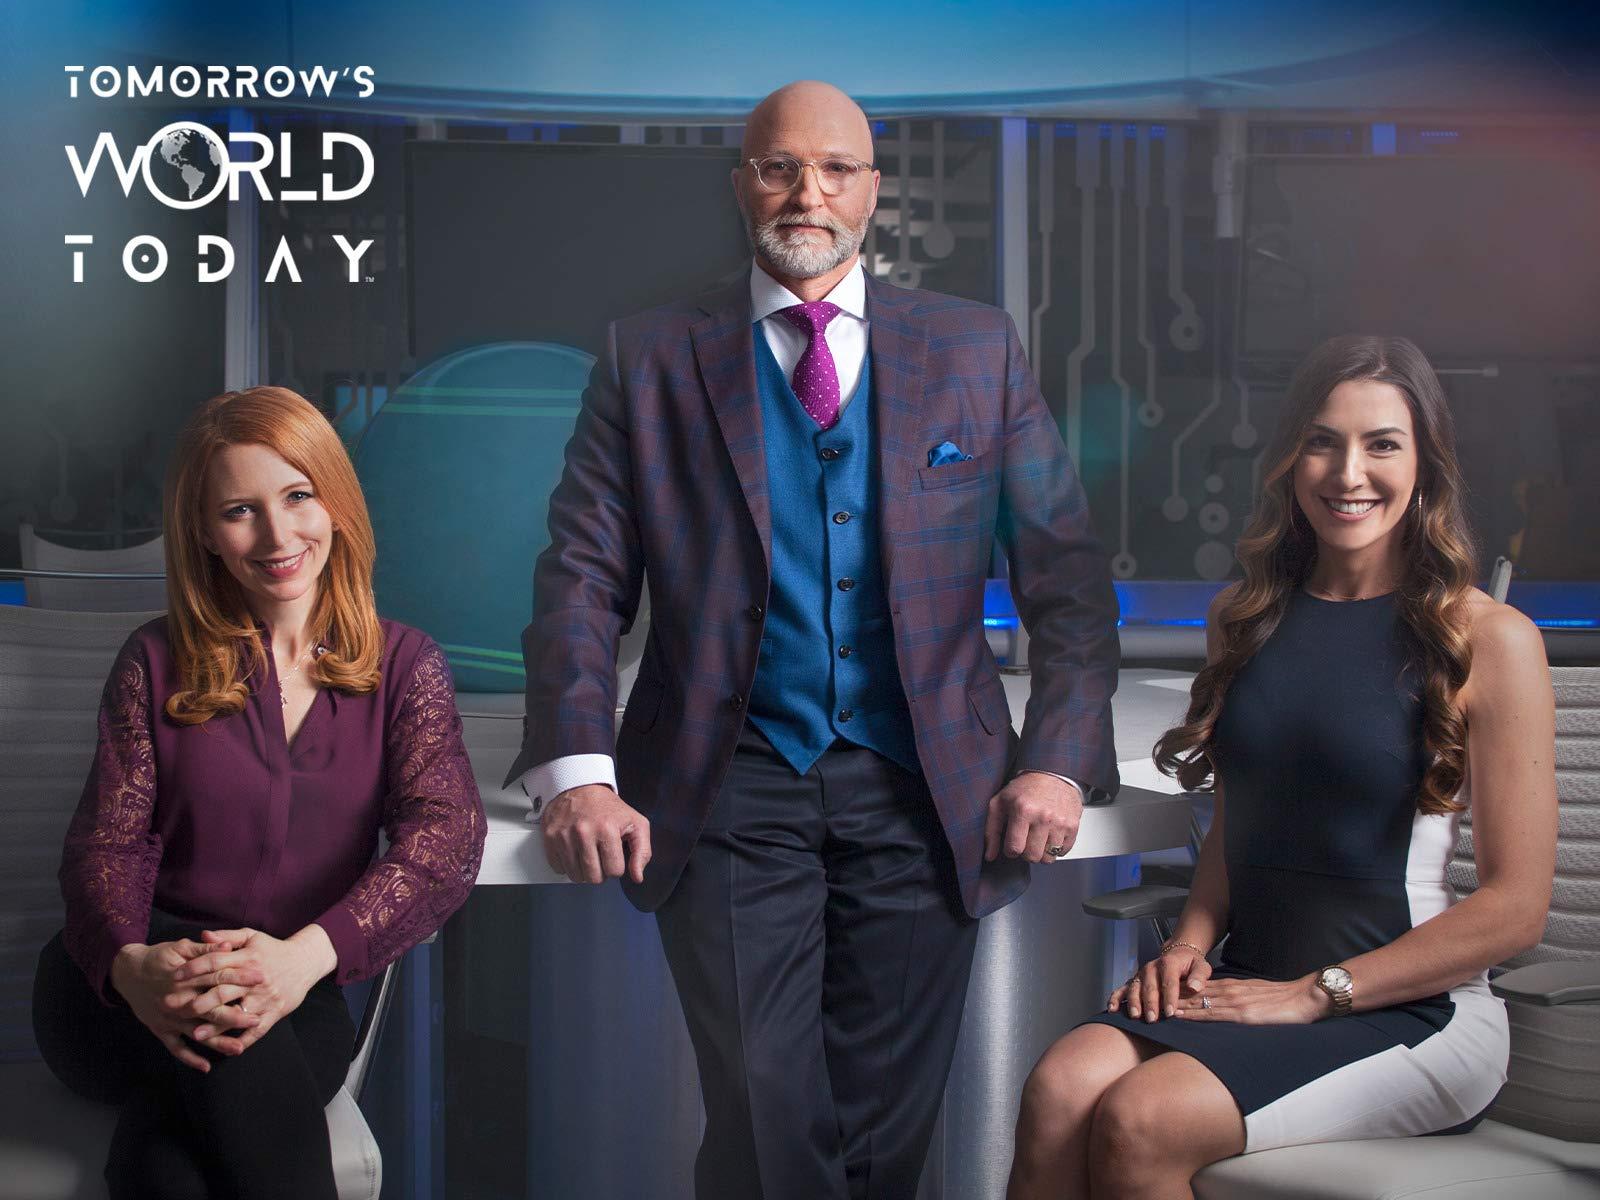 Tomorrow's World Today on Amazon Prime Video UK